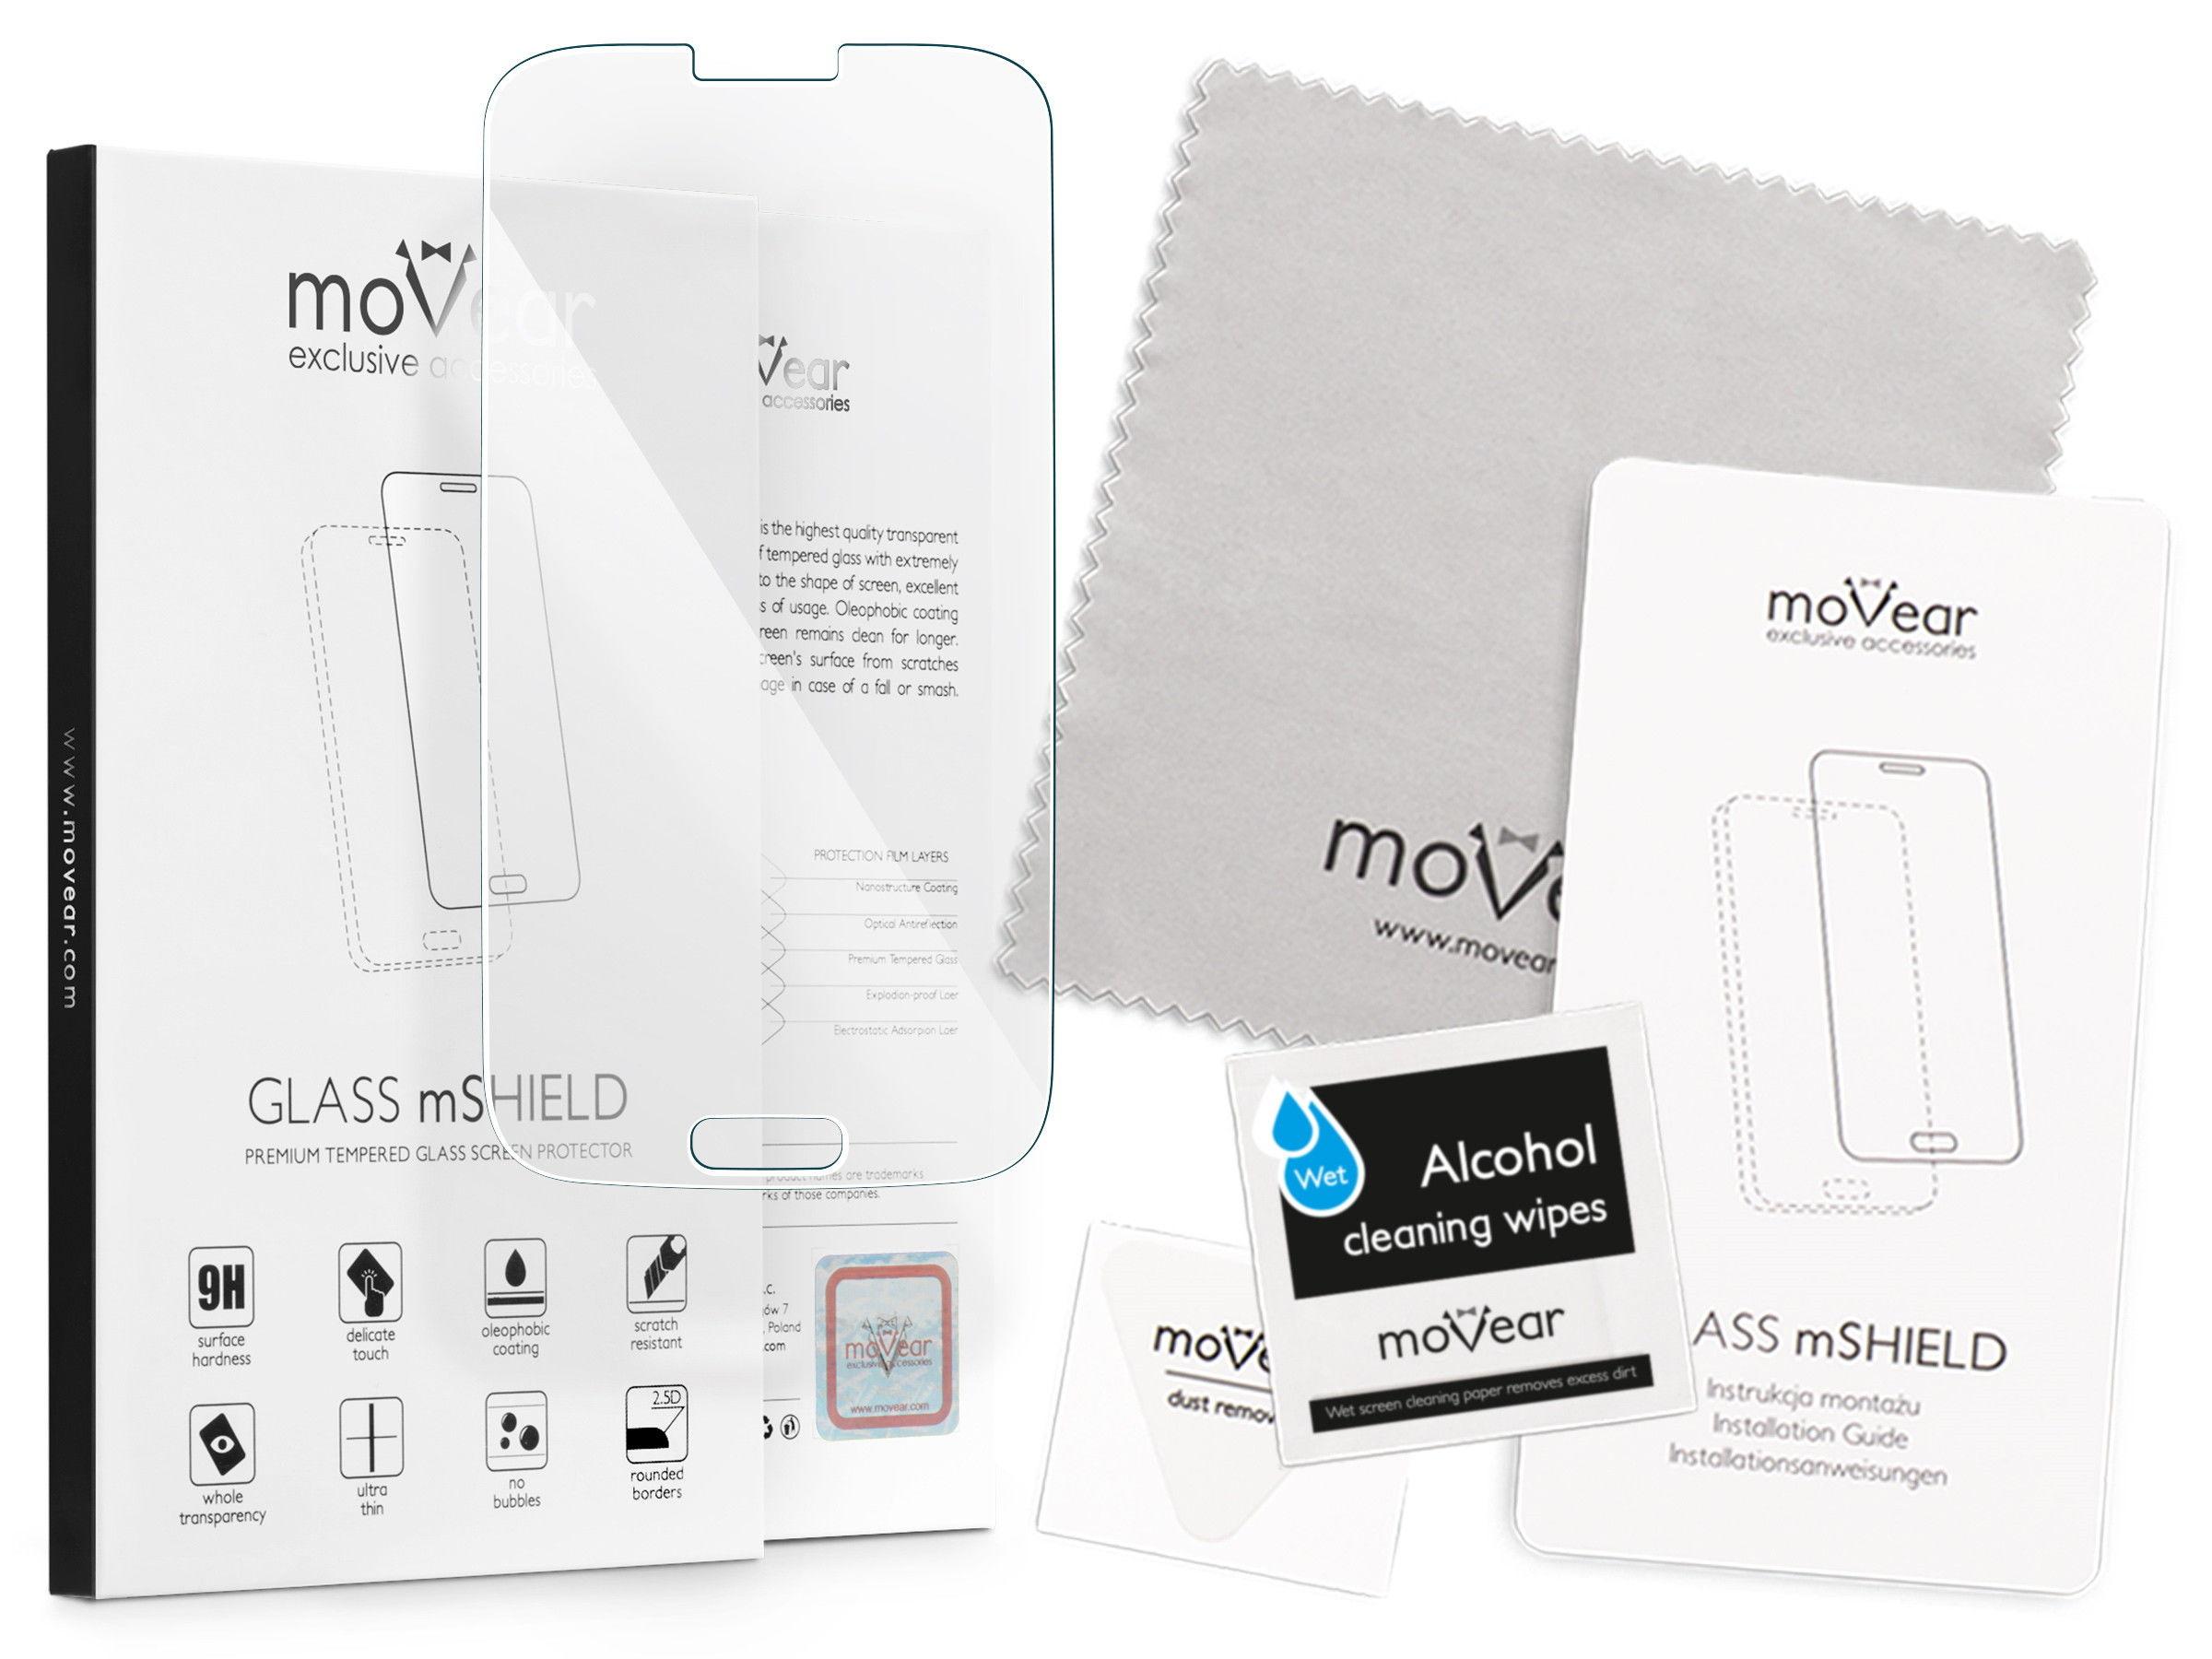 Glass Mshield 2 5d Szklo Hartowane Do Samsung Galaxy S4 Movear Pl